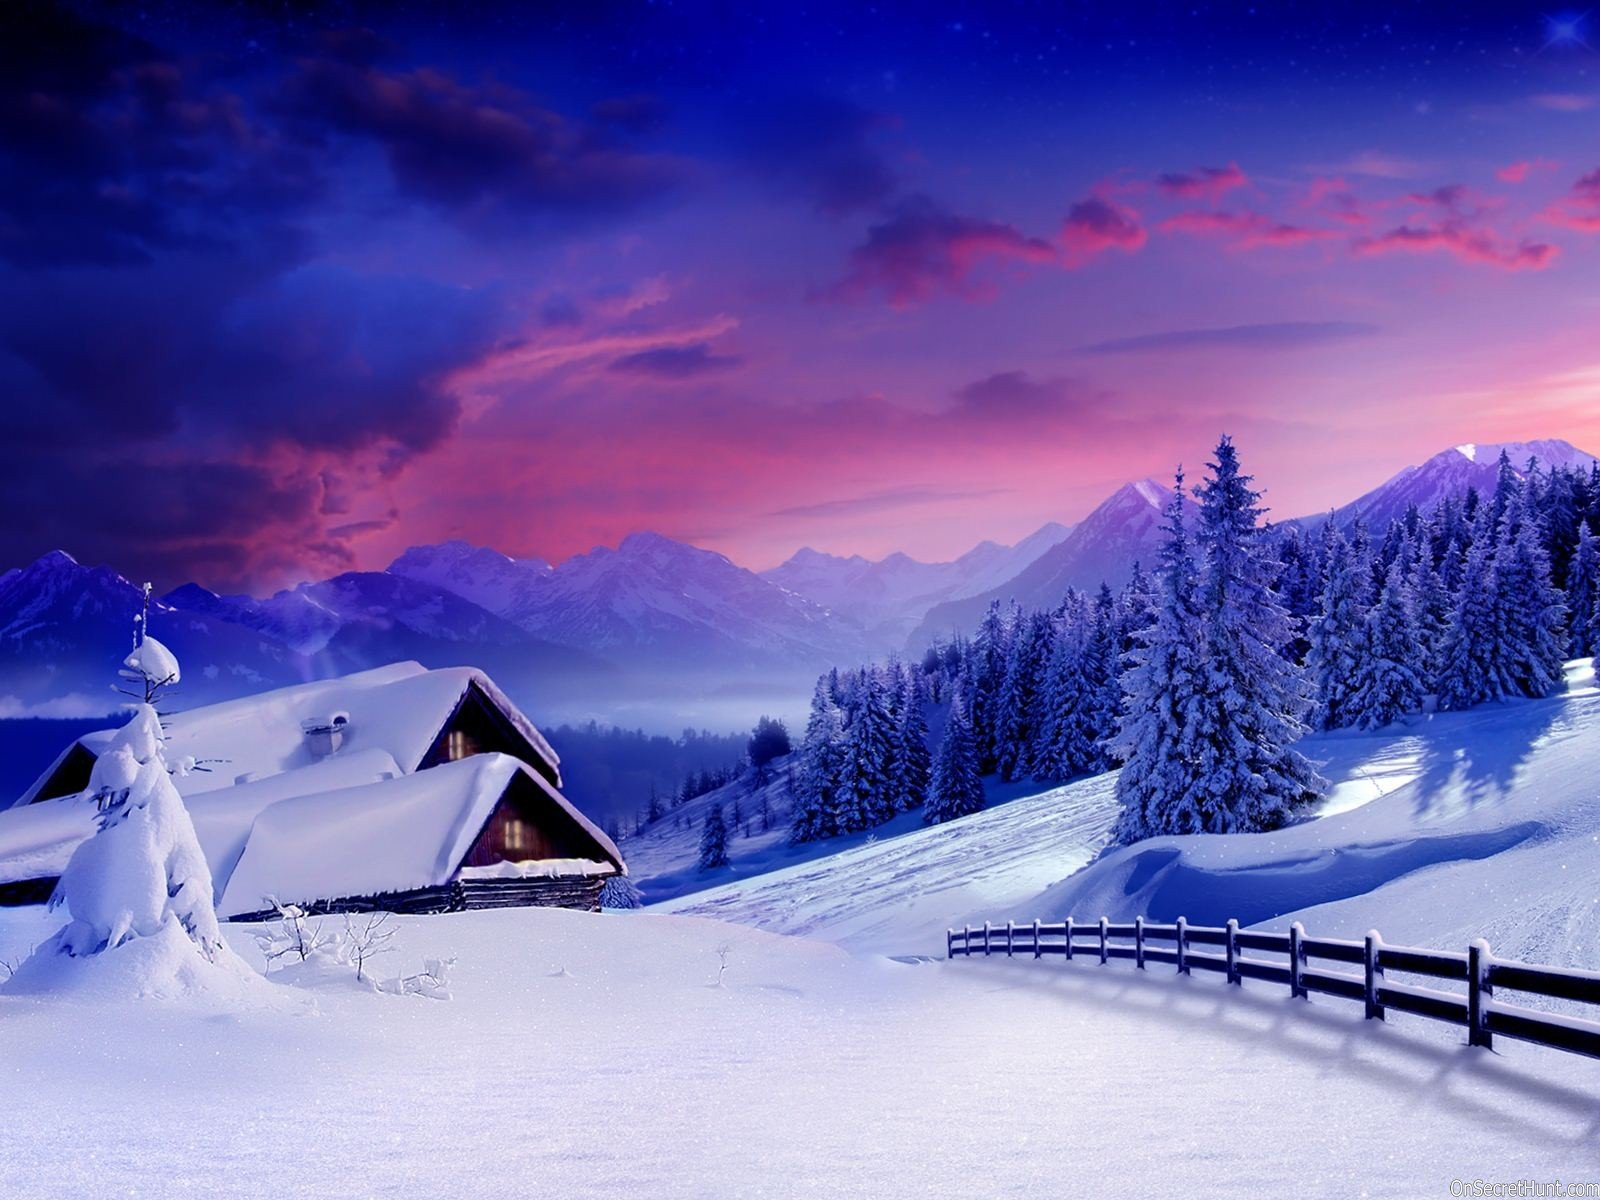 Snow Wallpaper Downloads 8565 Wallpaper WallDiskPaper 1600x1200